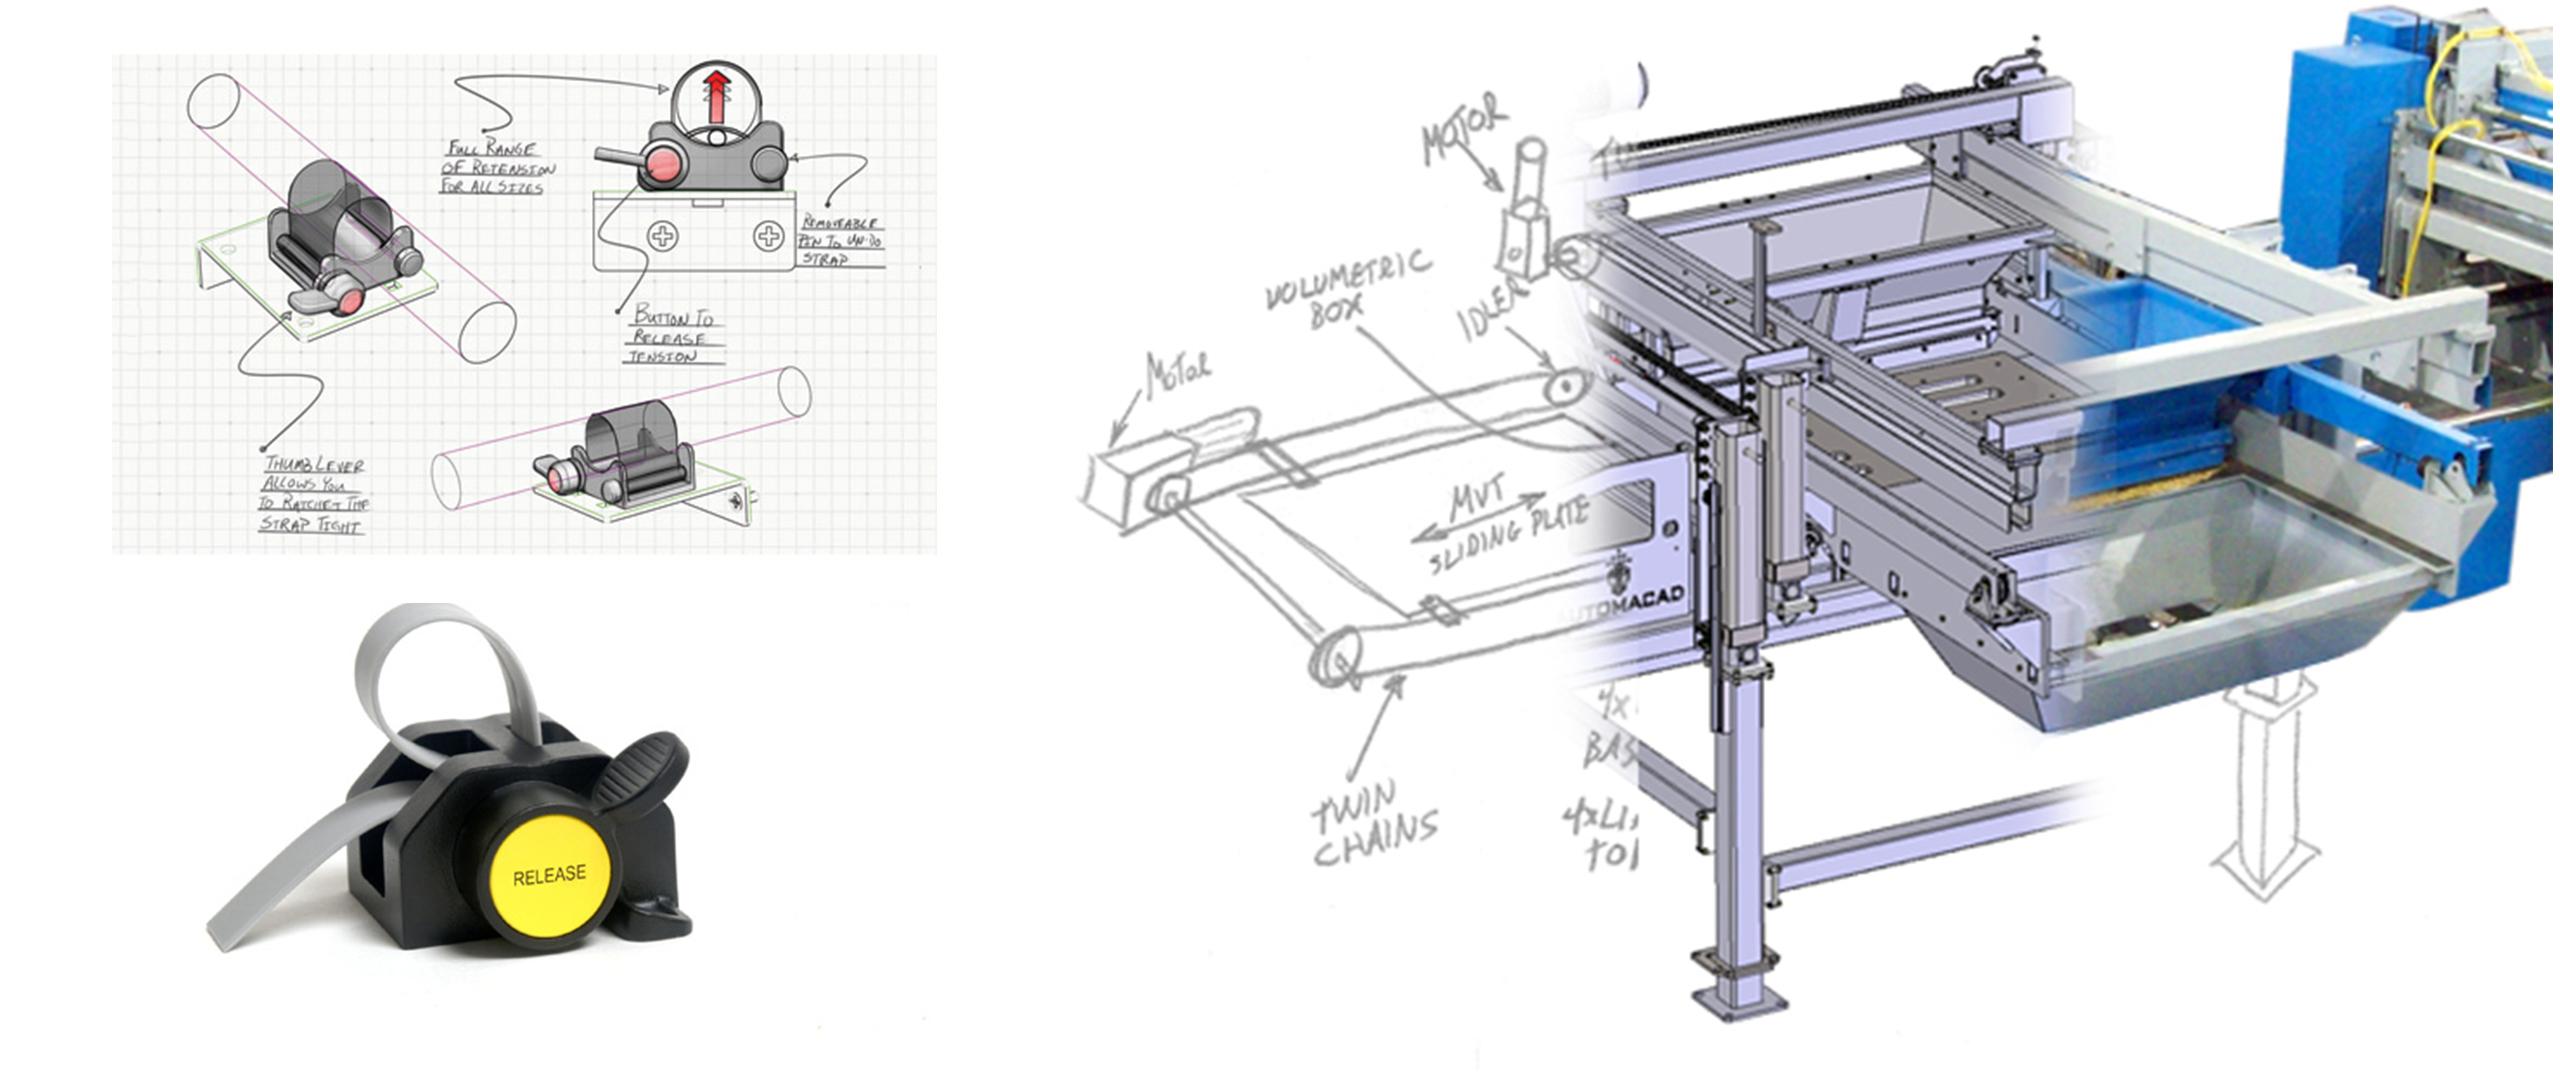 Prototype Diagram Parts